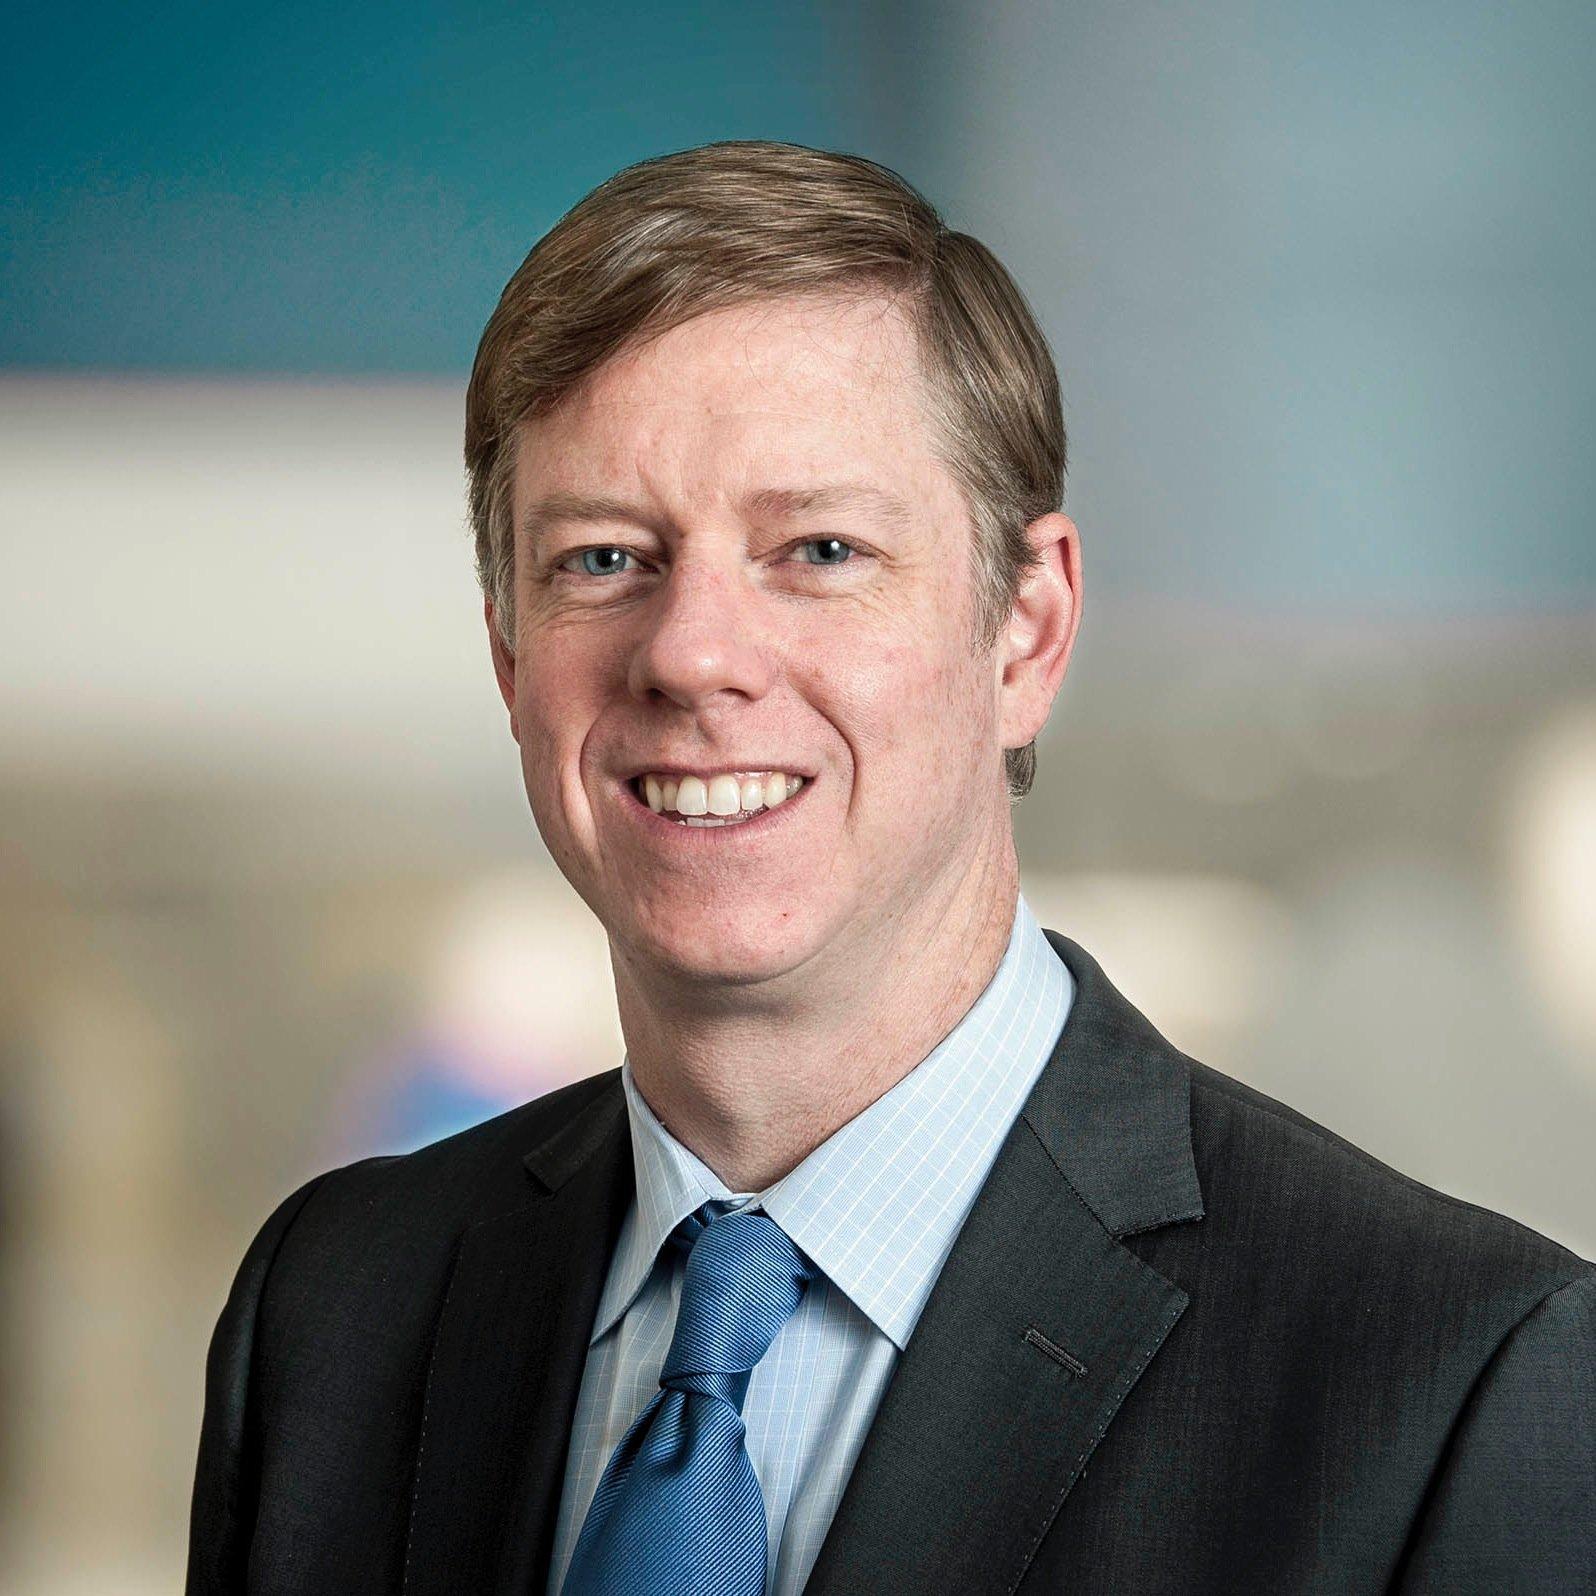 Samuel R. Browd, MD, PhD - Director of Hydrocephalus Seattle Children's